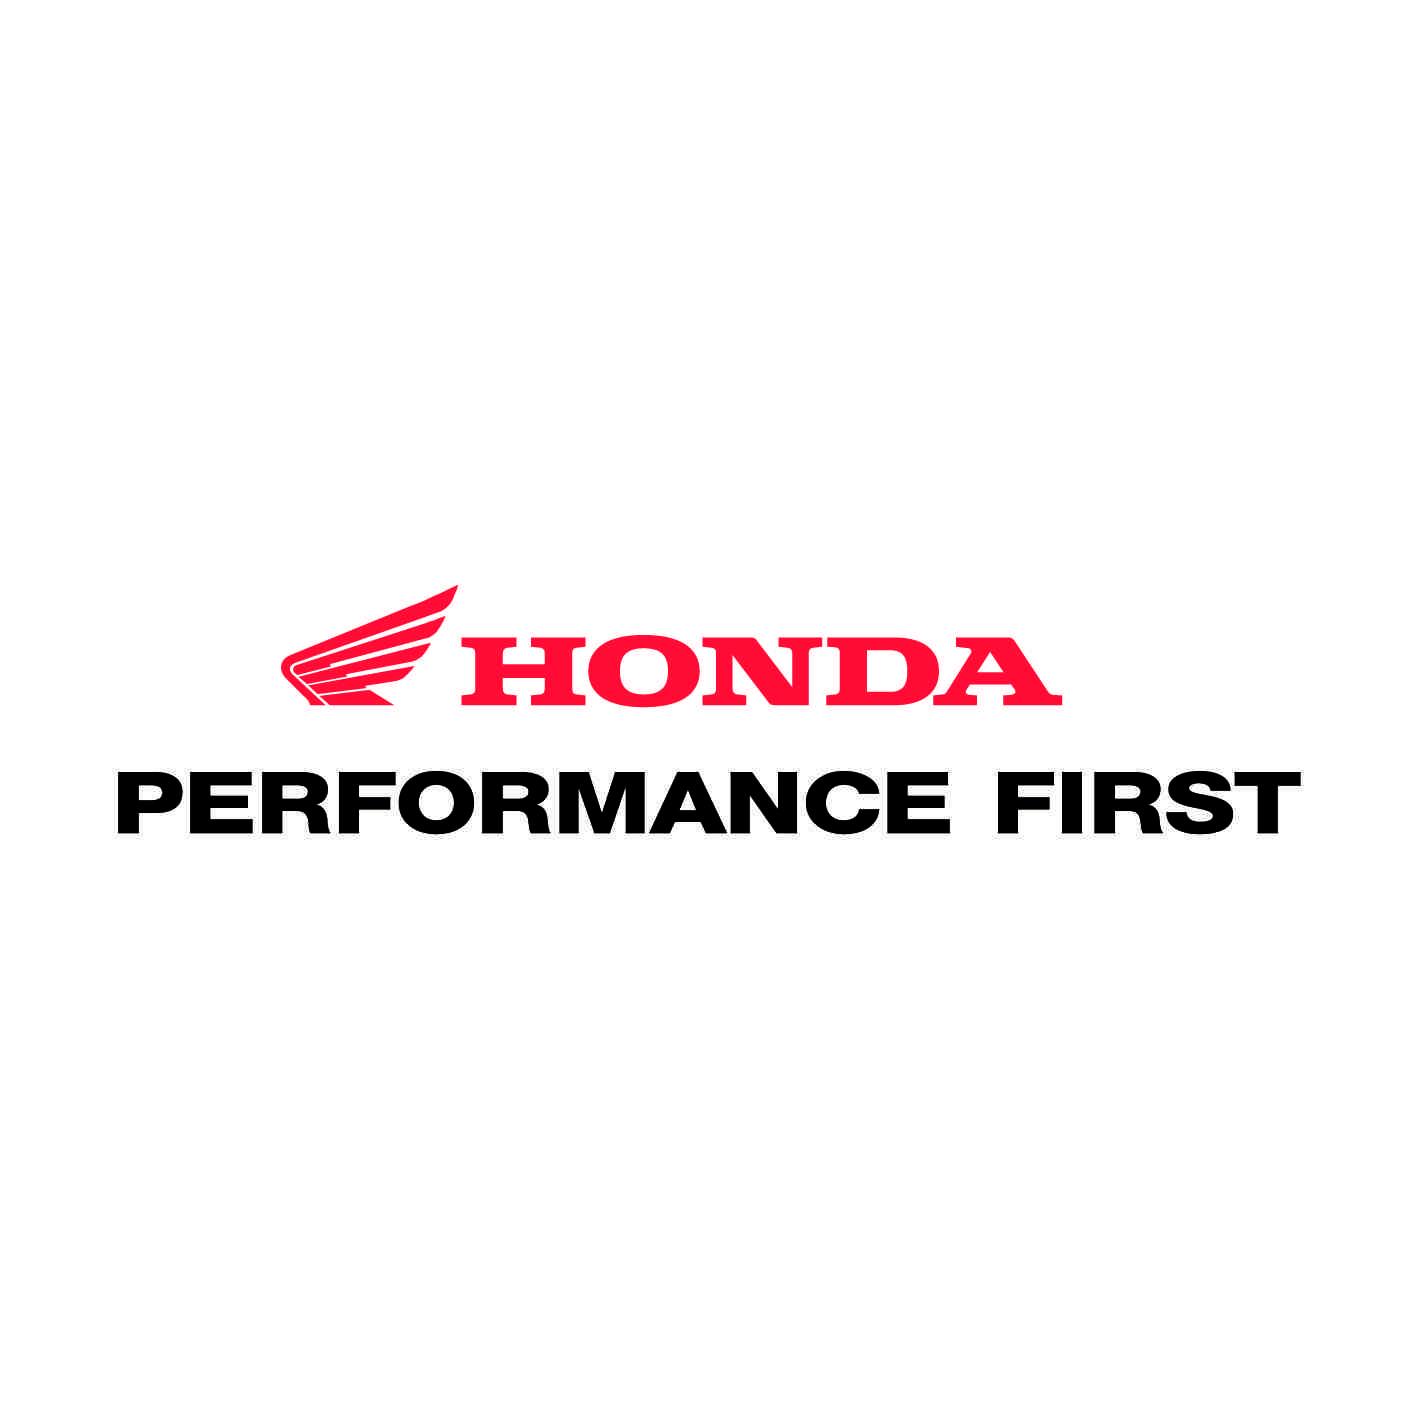 honda-ref7-stickers-moto-casque-scooter-sticker-autocollant-adhesifs